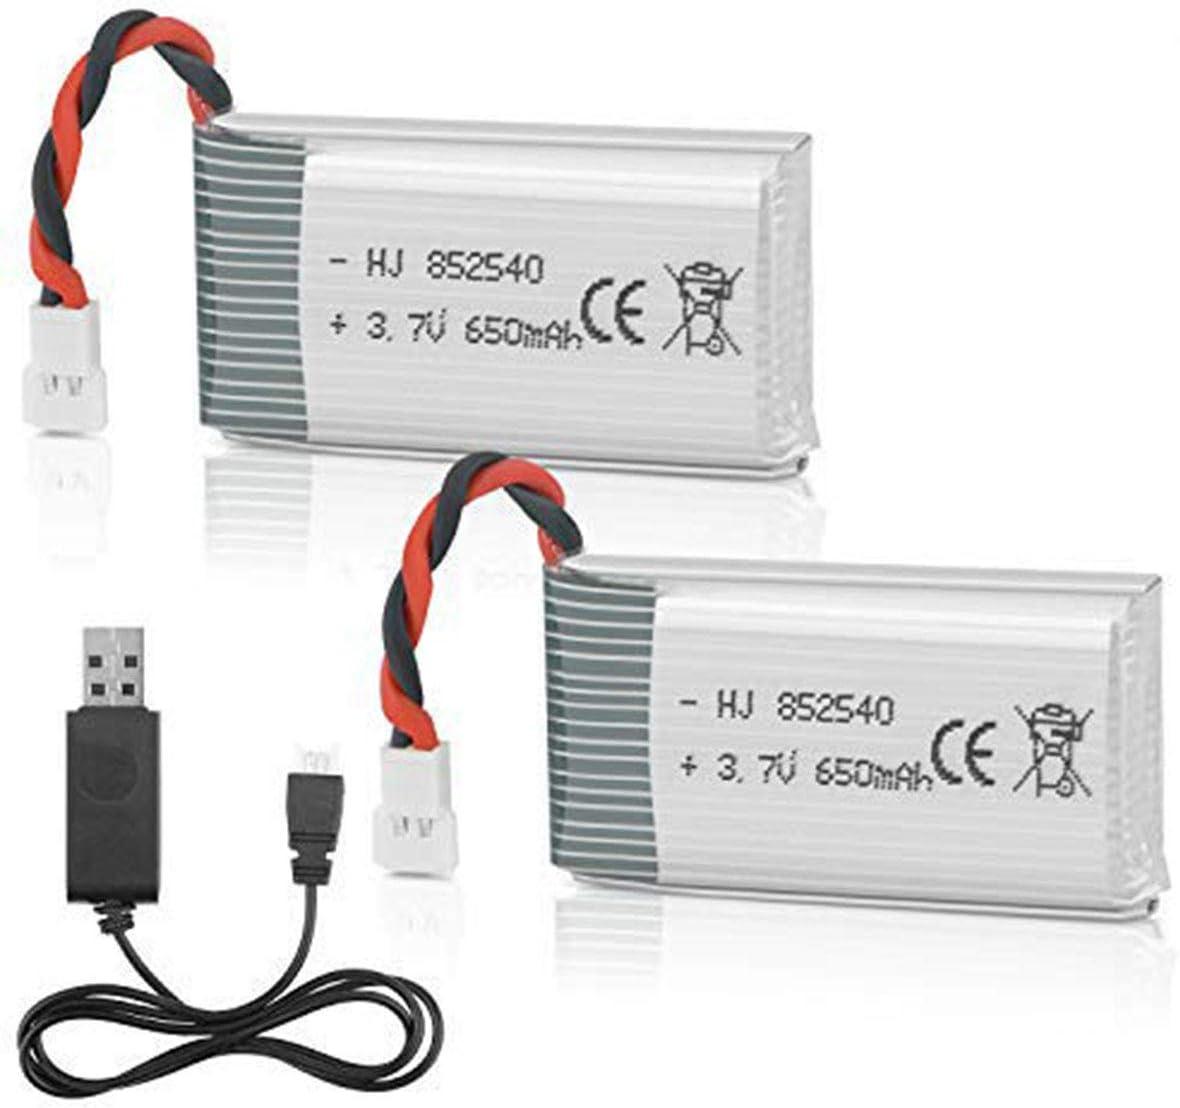 2 baterias para drone Syma X5C X5SW X5C X5SC M68 M62 650mah